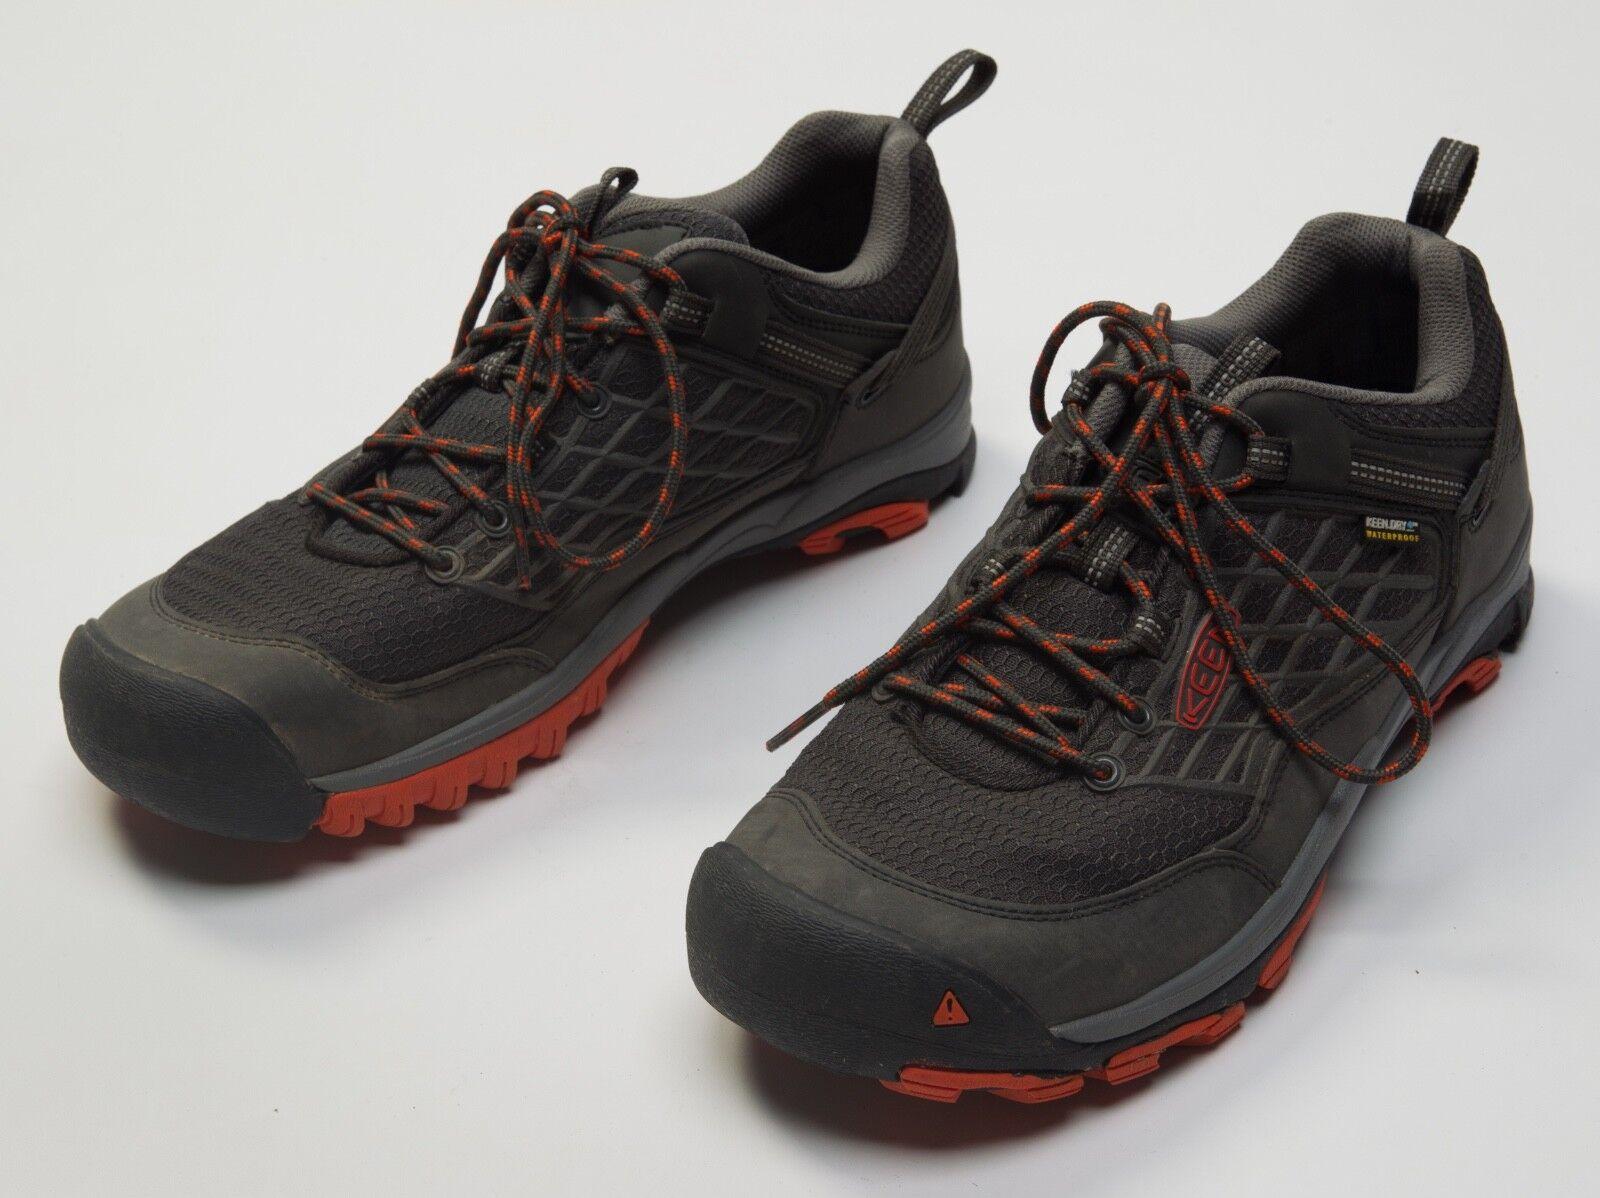 Men's KEEN Saltzman Raven Koi Low WP Waterproof Hiking shoes Size Sz US 10 US10